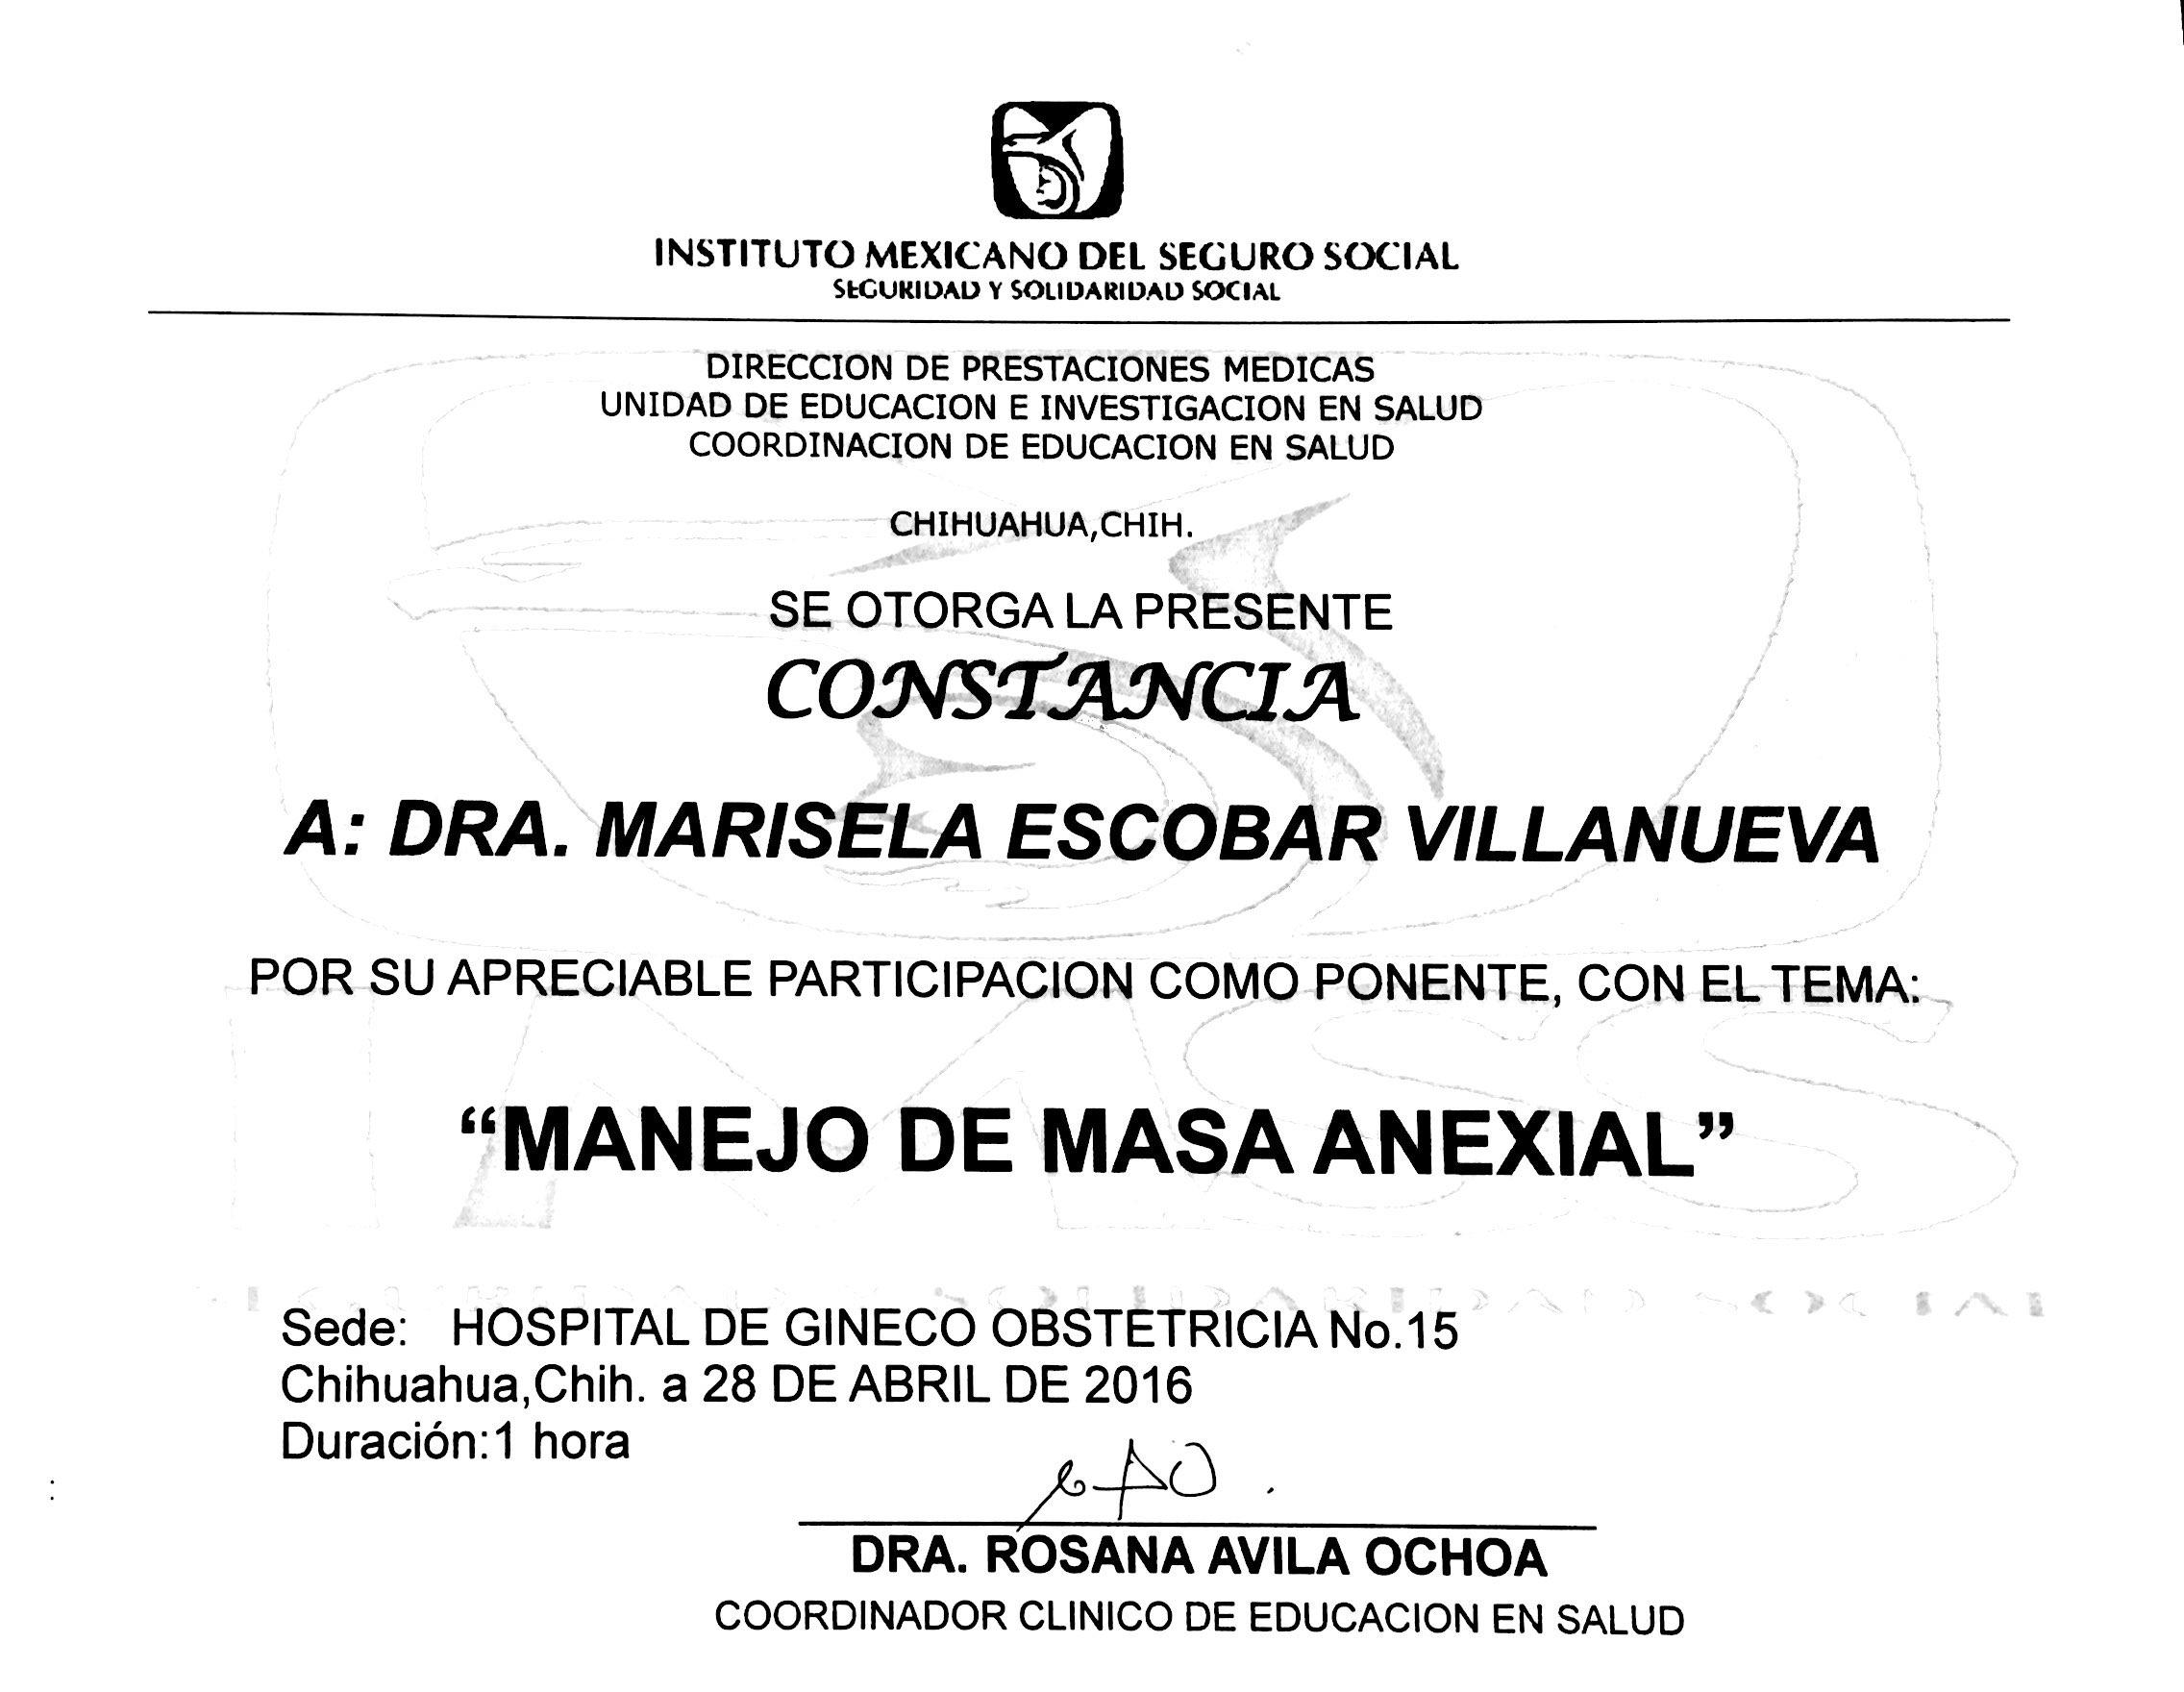 Nuevo doc 2018-02-20 11.21.39_20